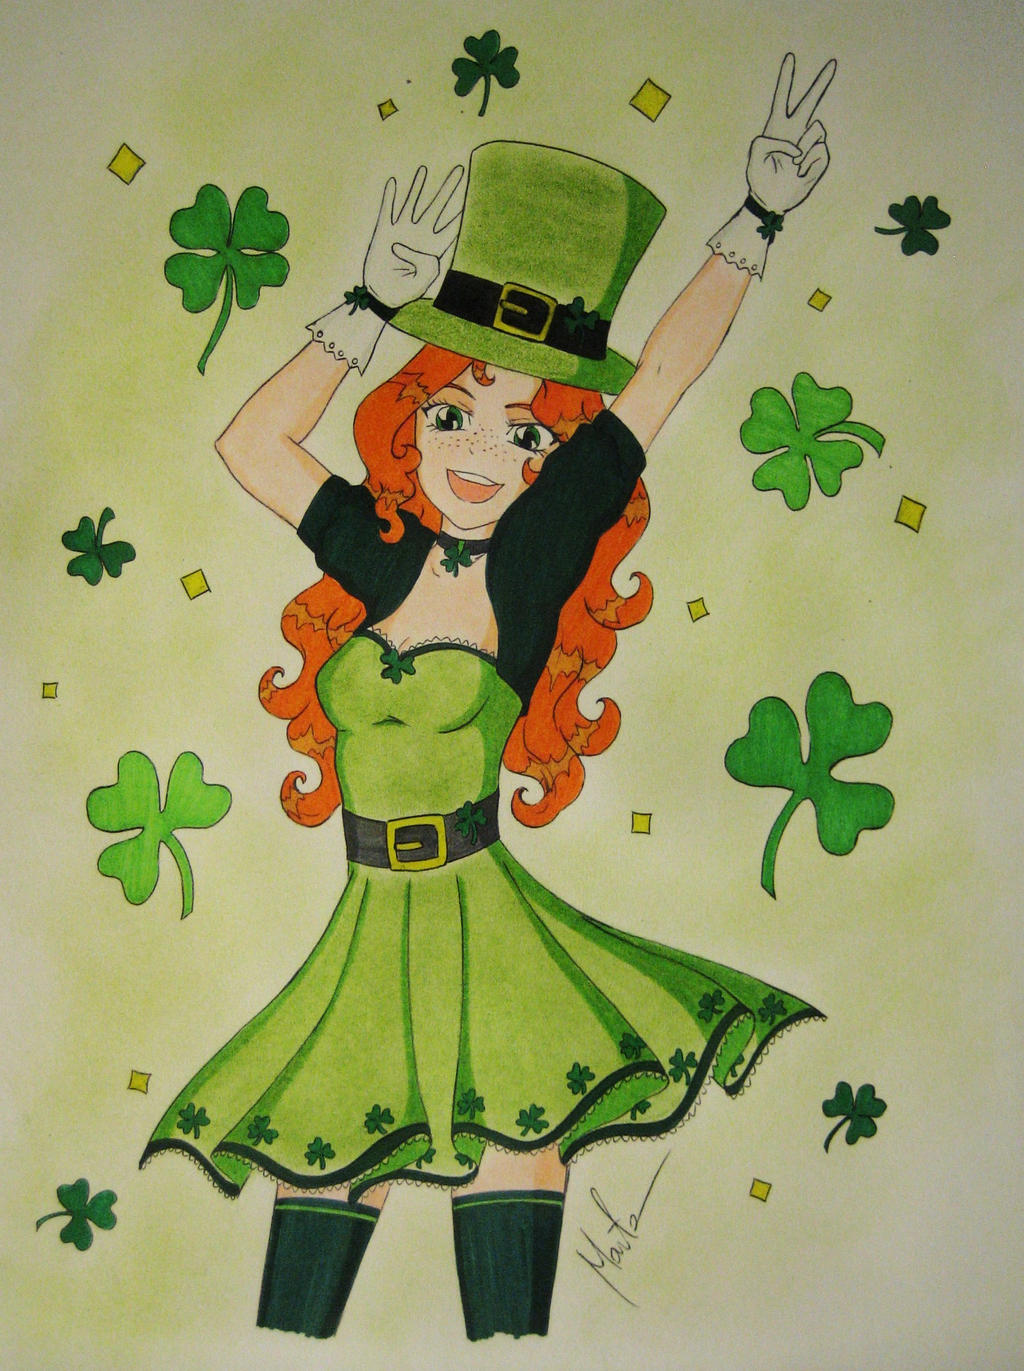 Happy St. Patrick's Day! by Natsu-chan-94